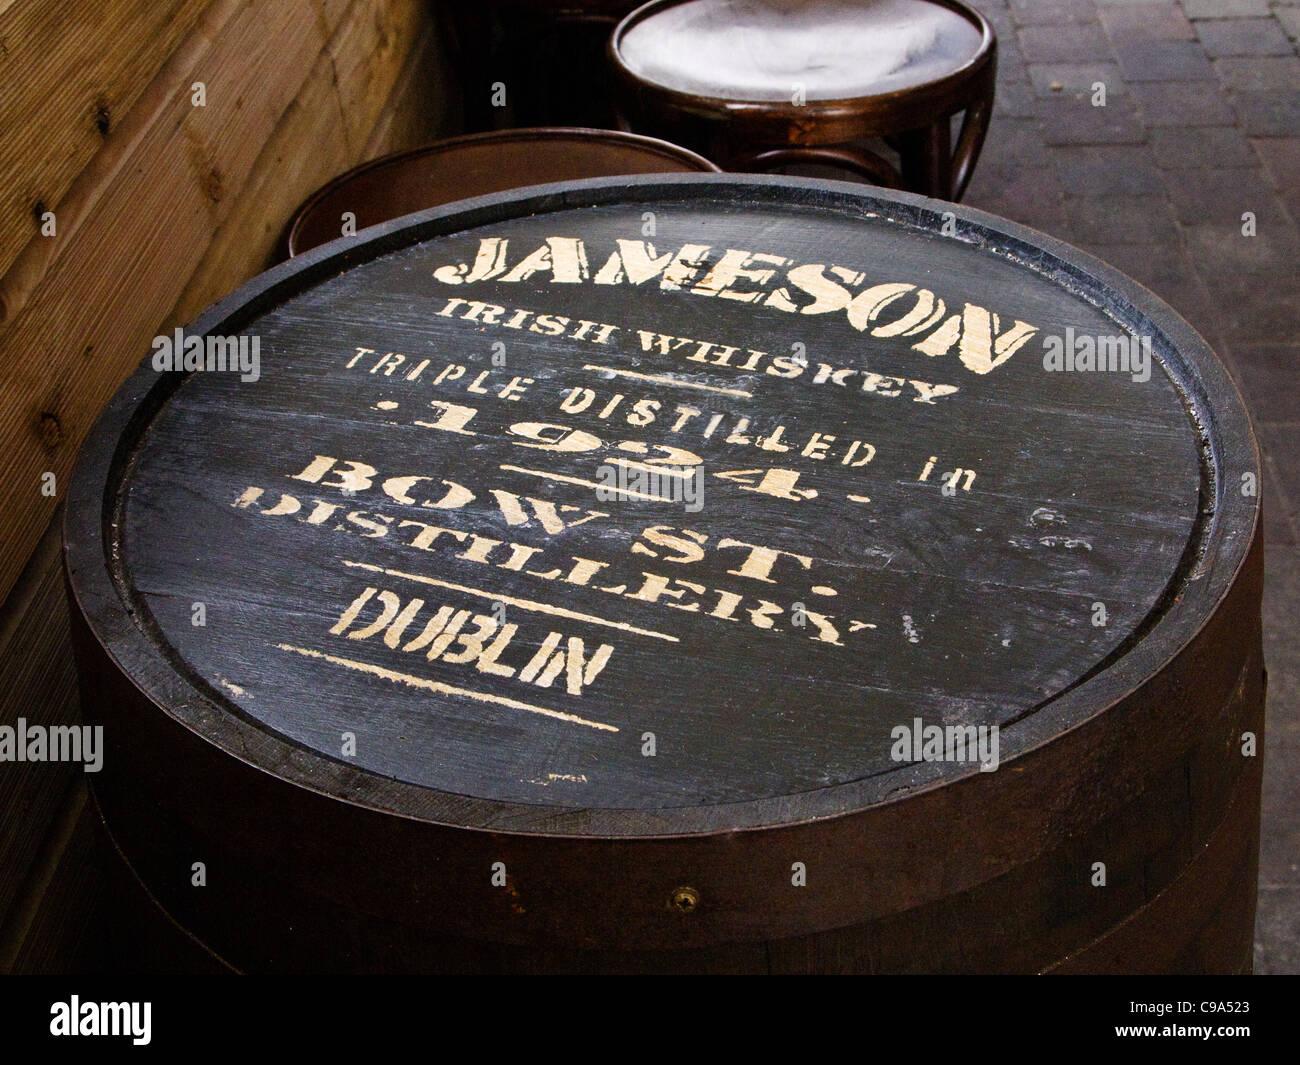 Whiskey Barrel Lid Stock Photos Whiskey Barrel Lid Stock Images